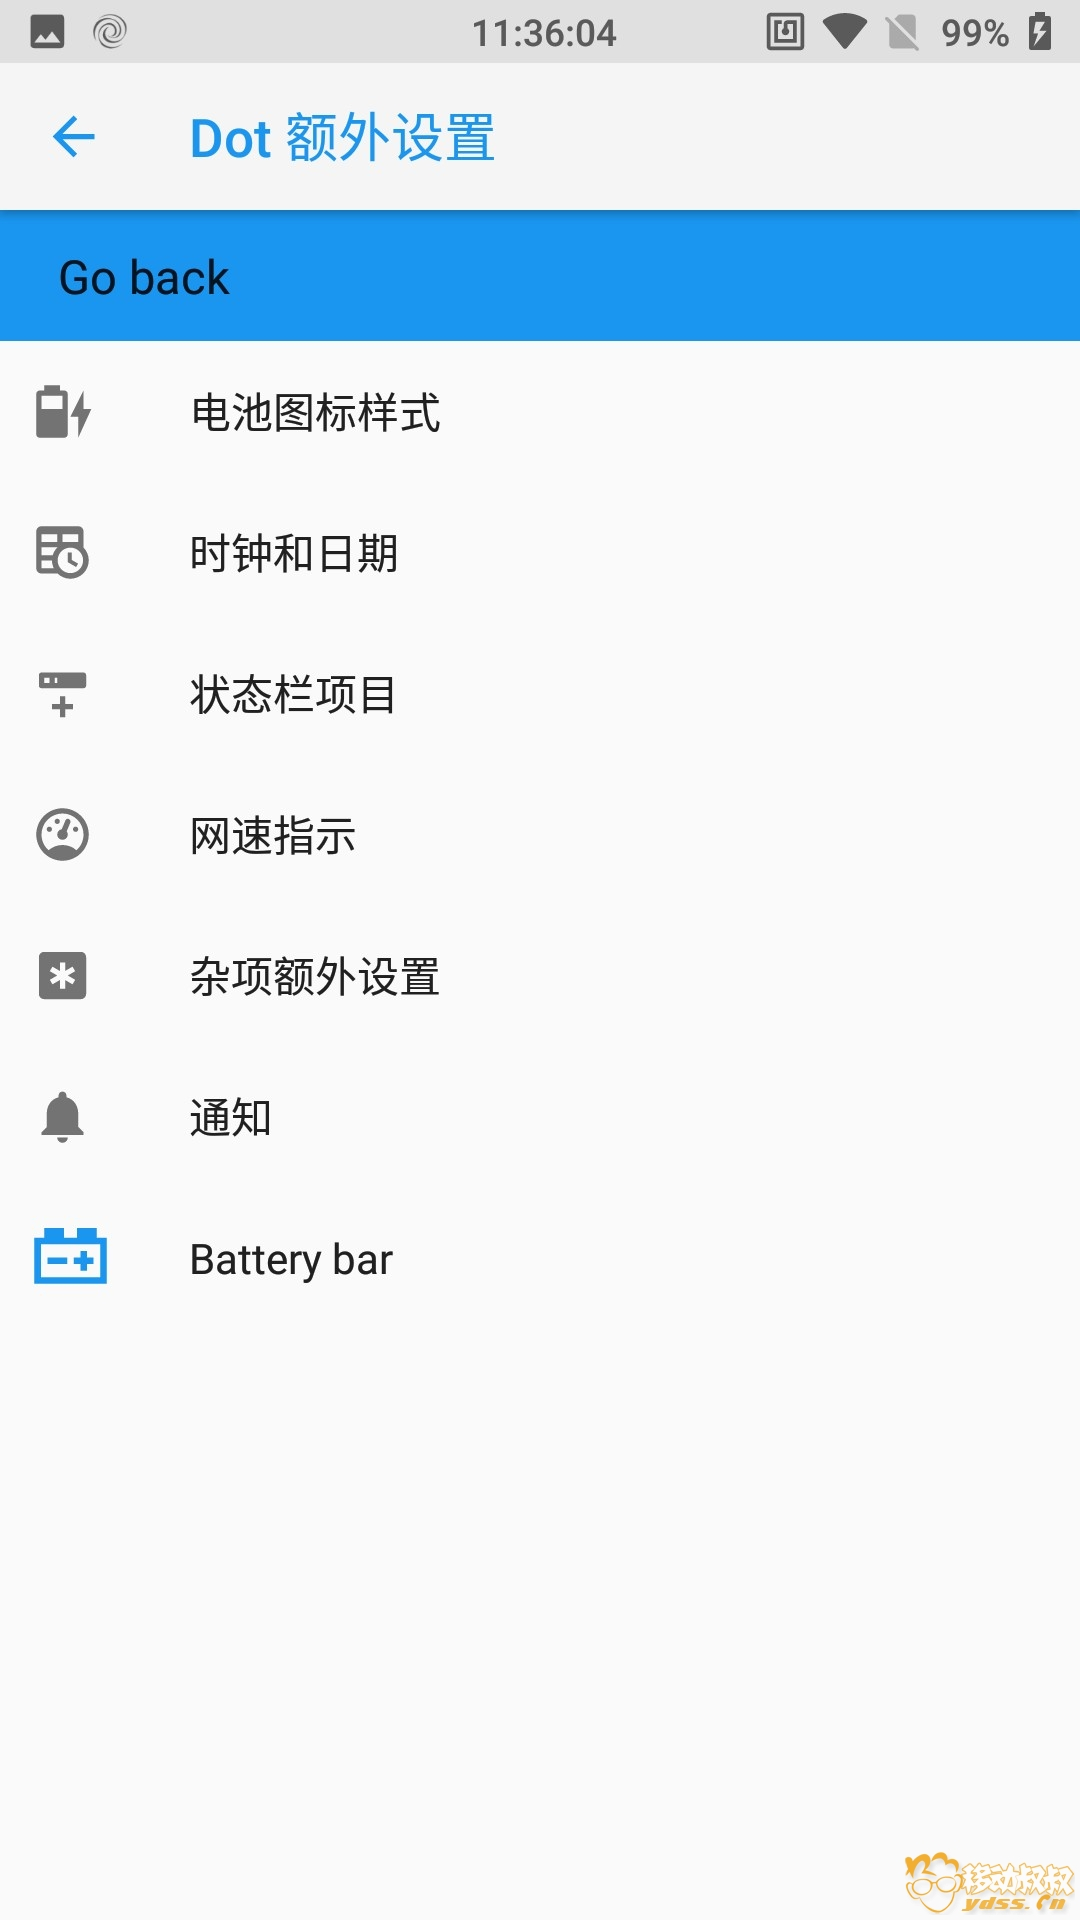 New0106Screenshot___20180920-113605.jpg